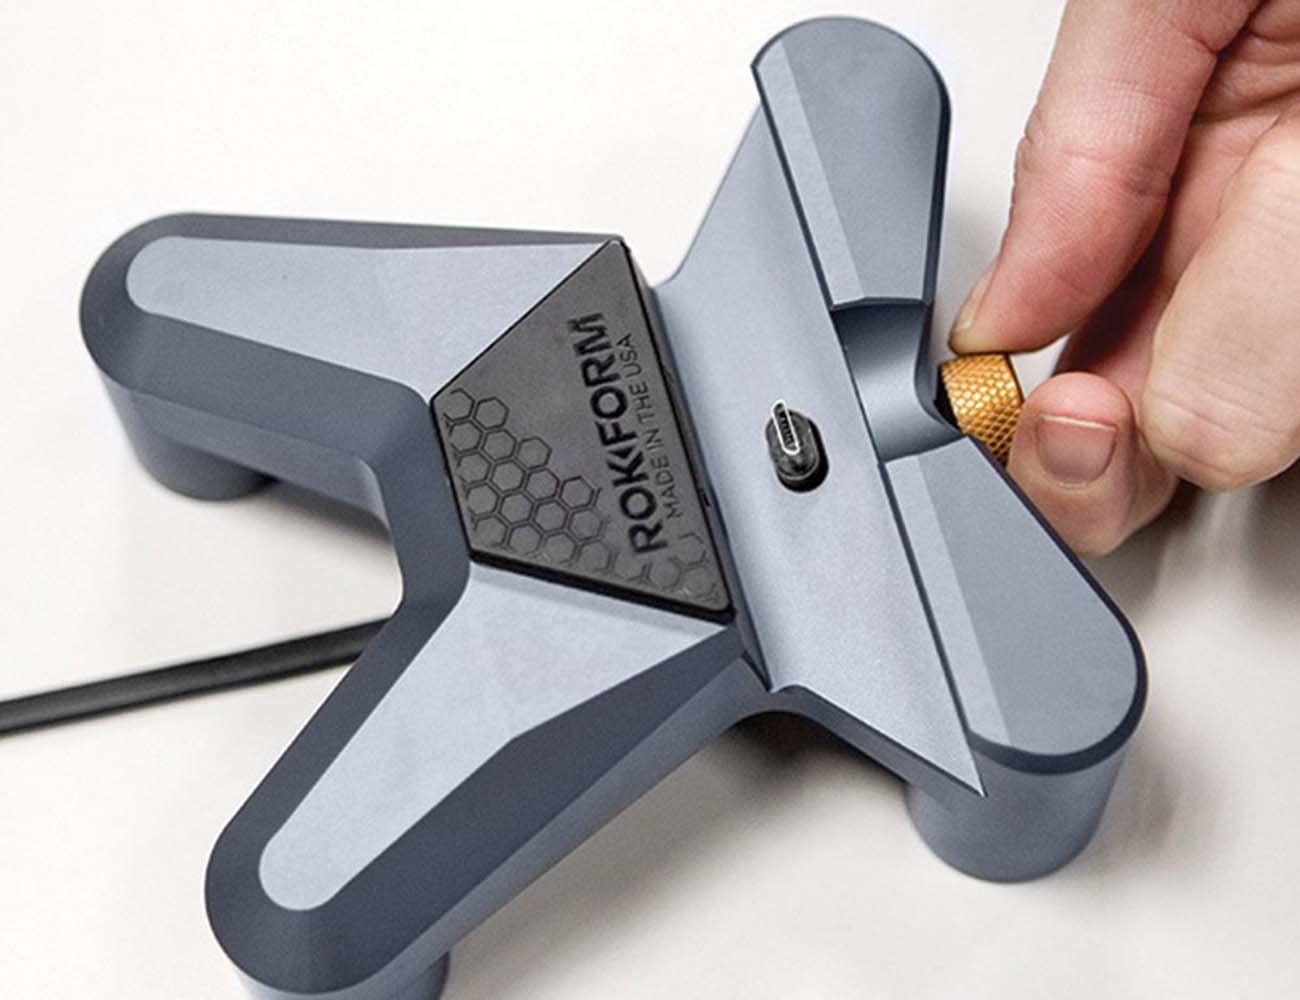 Rokform Predator iPhone Docking Station